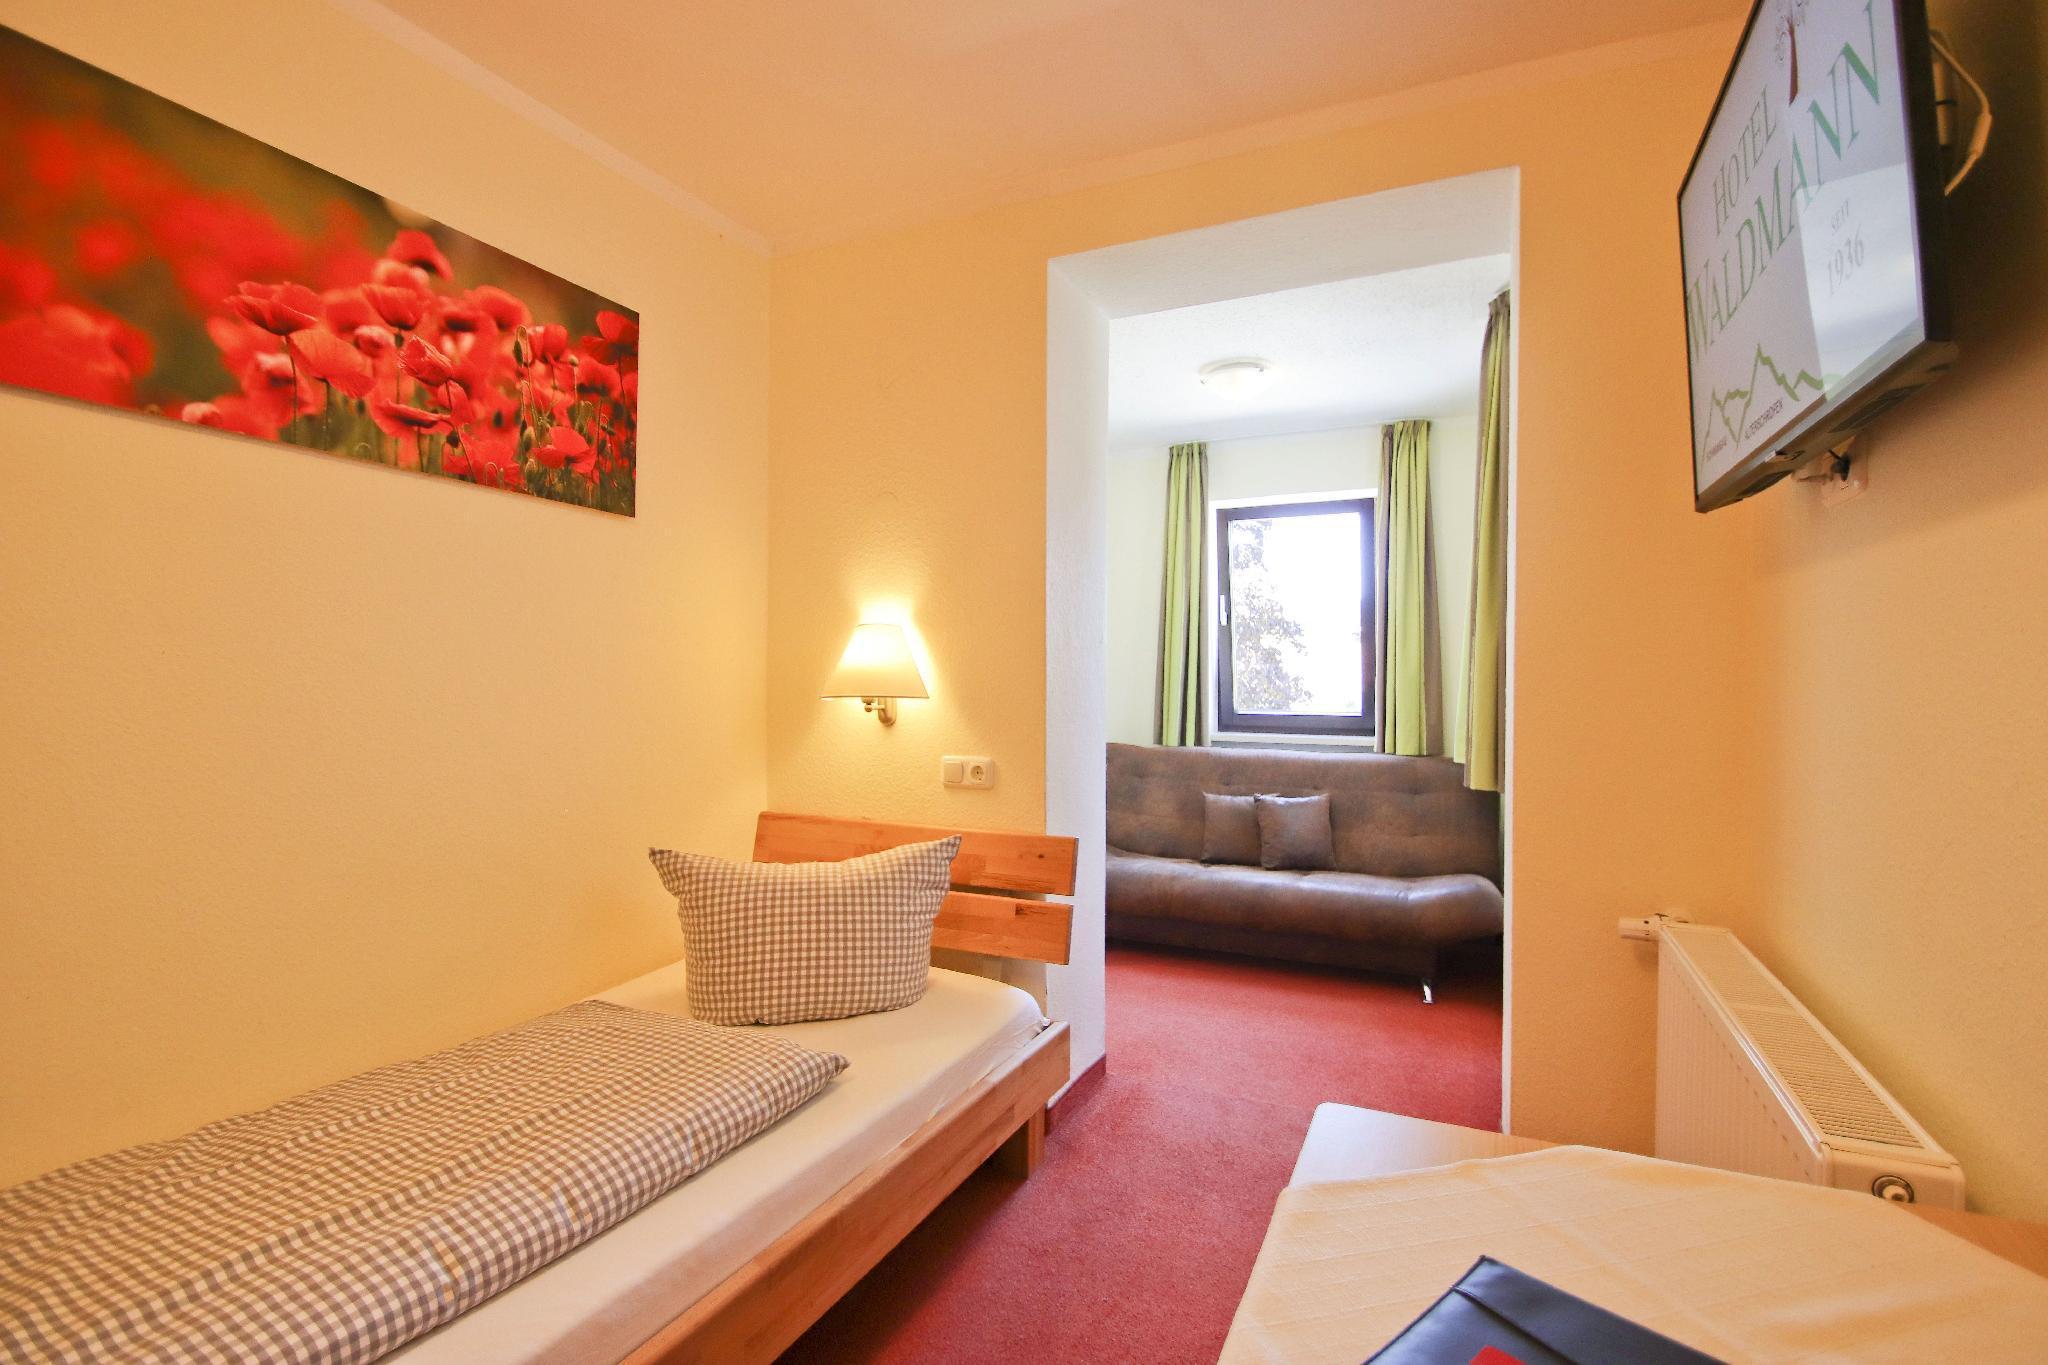 Hotel Waldmann Schwangau Germany Photos Room Rates